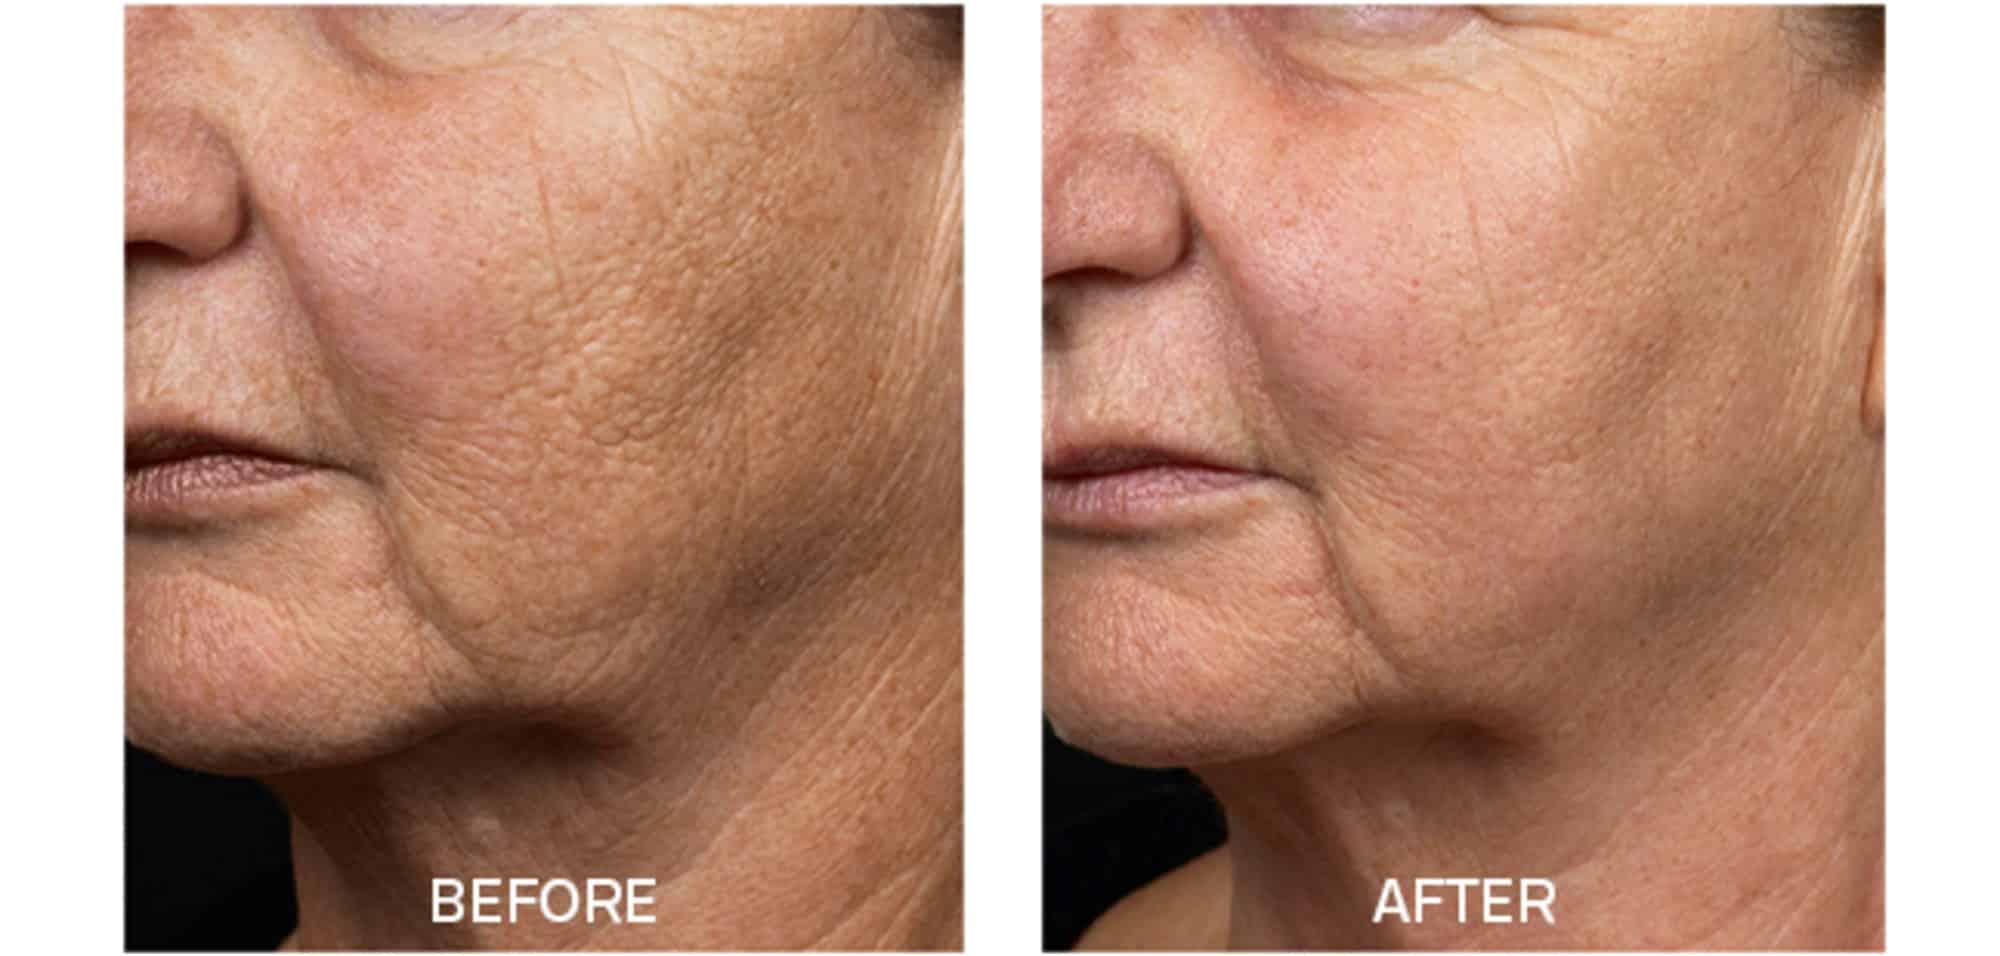 Fraxel for Textured Skin